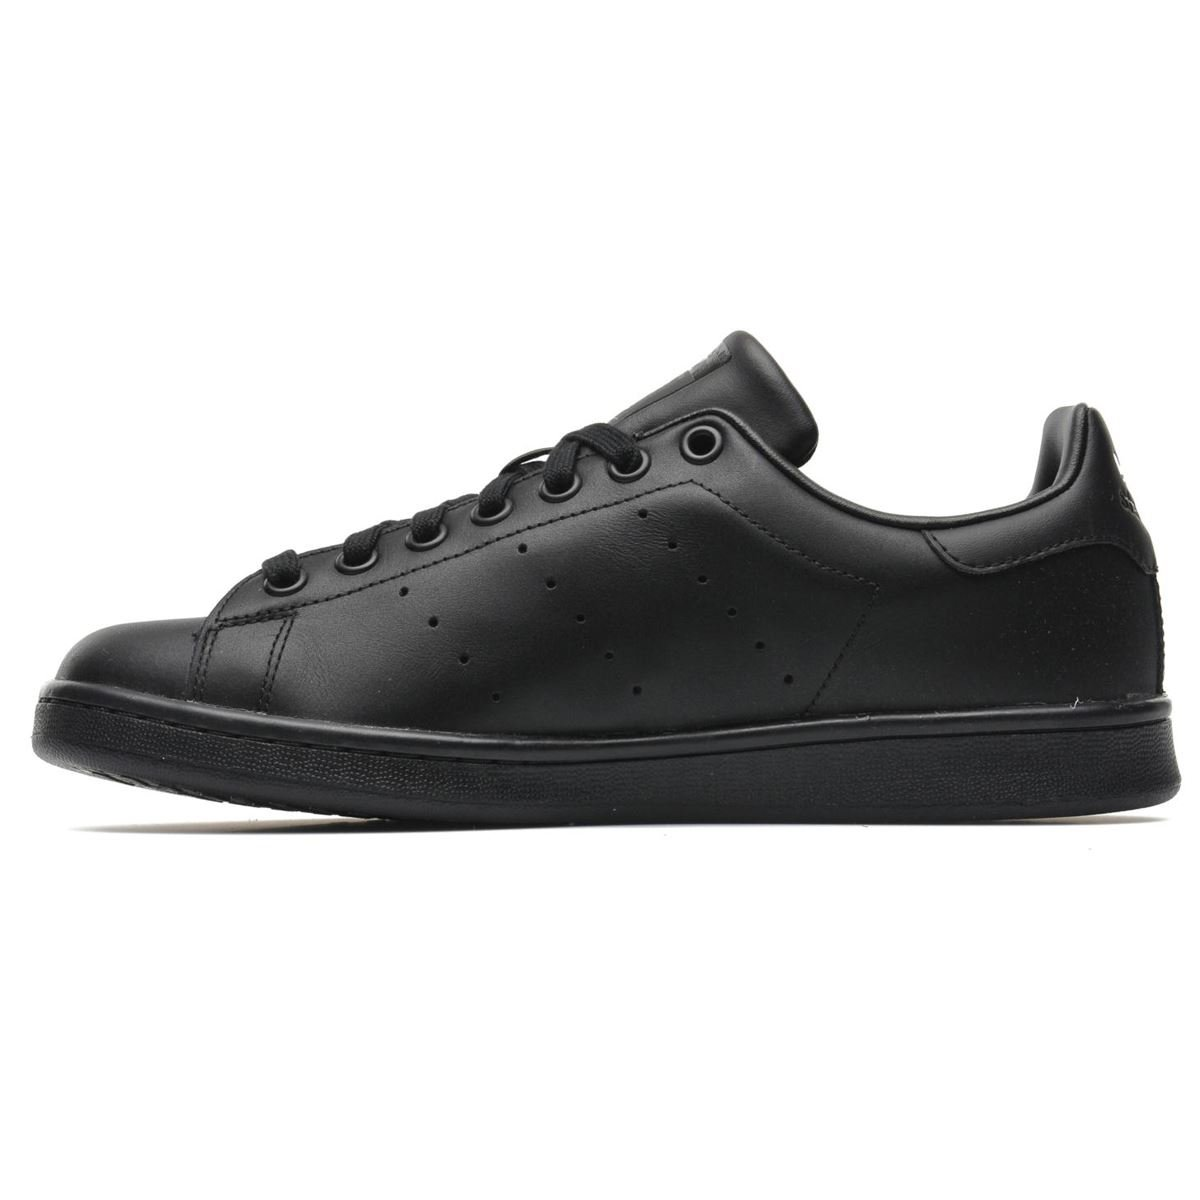 1a6ca8f7ce Amazon.com | adidas Originals Men's Stan Smith Shoes | Fashion Sneakers